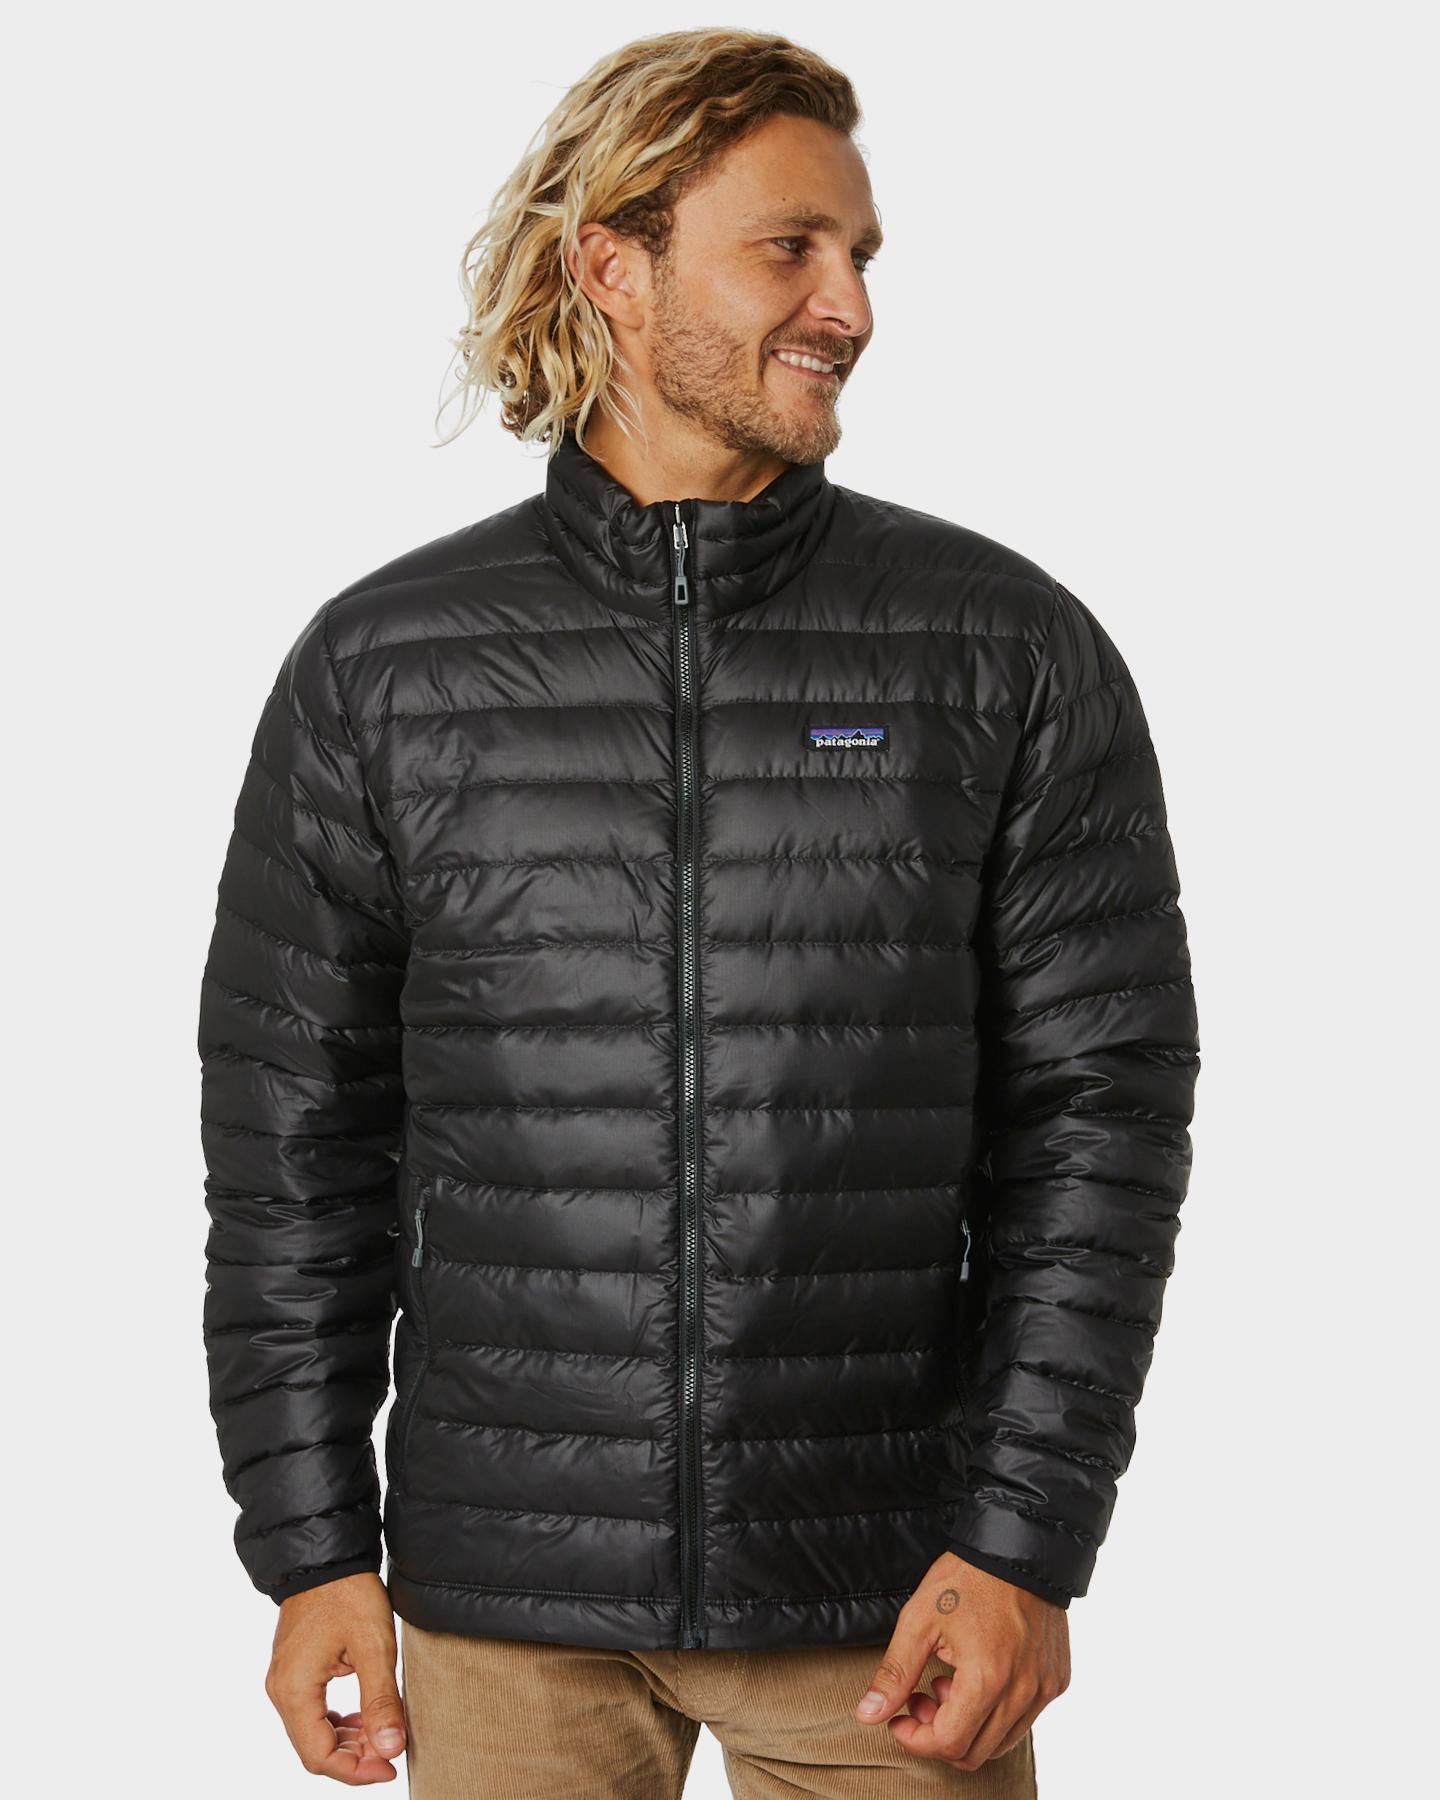 Patagonia Down Sweater Jacket - Black | SurfStitch